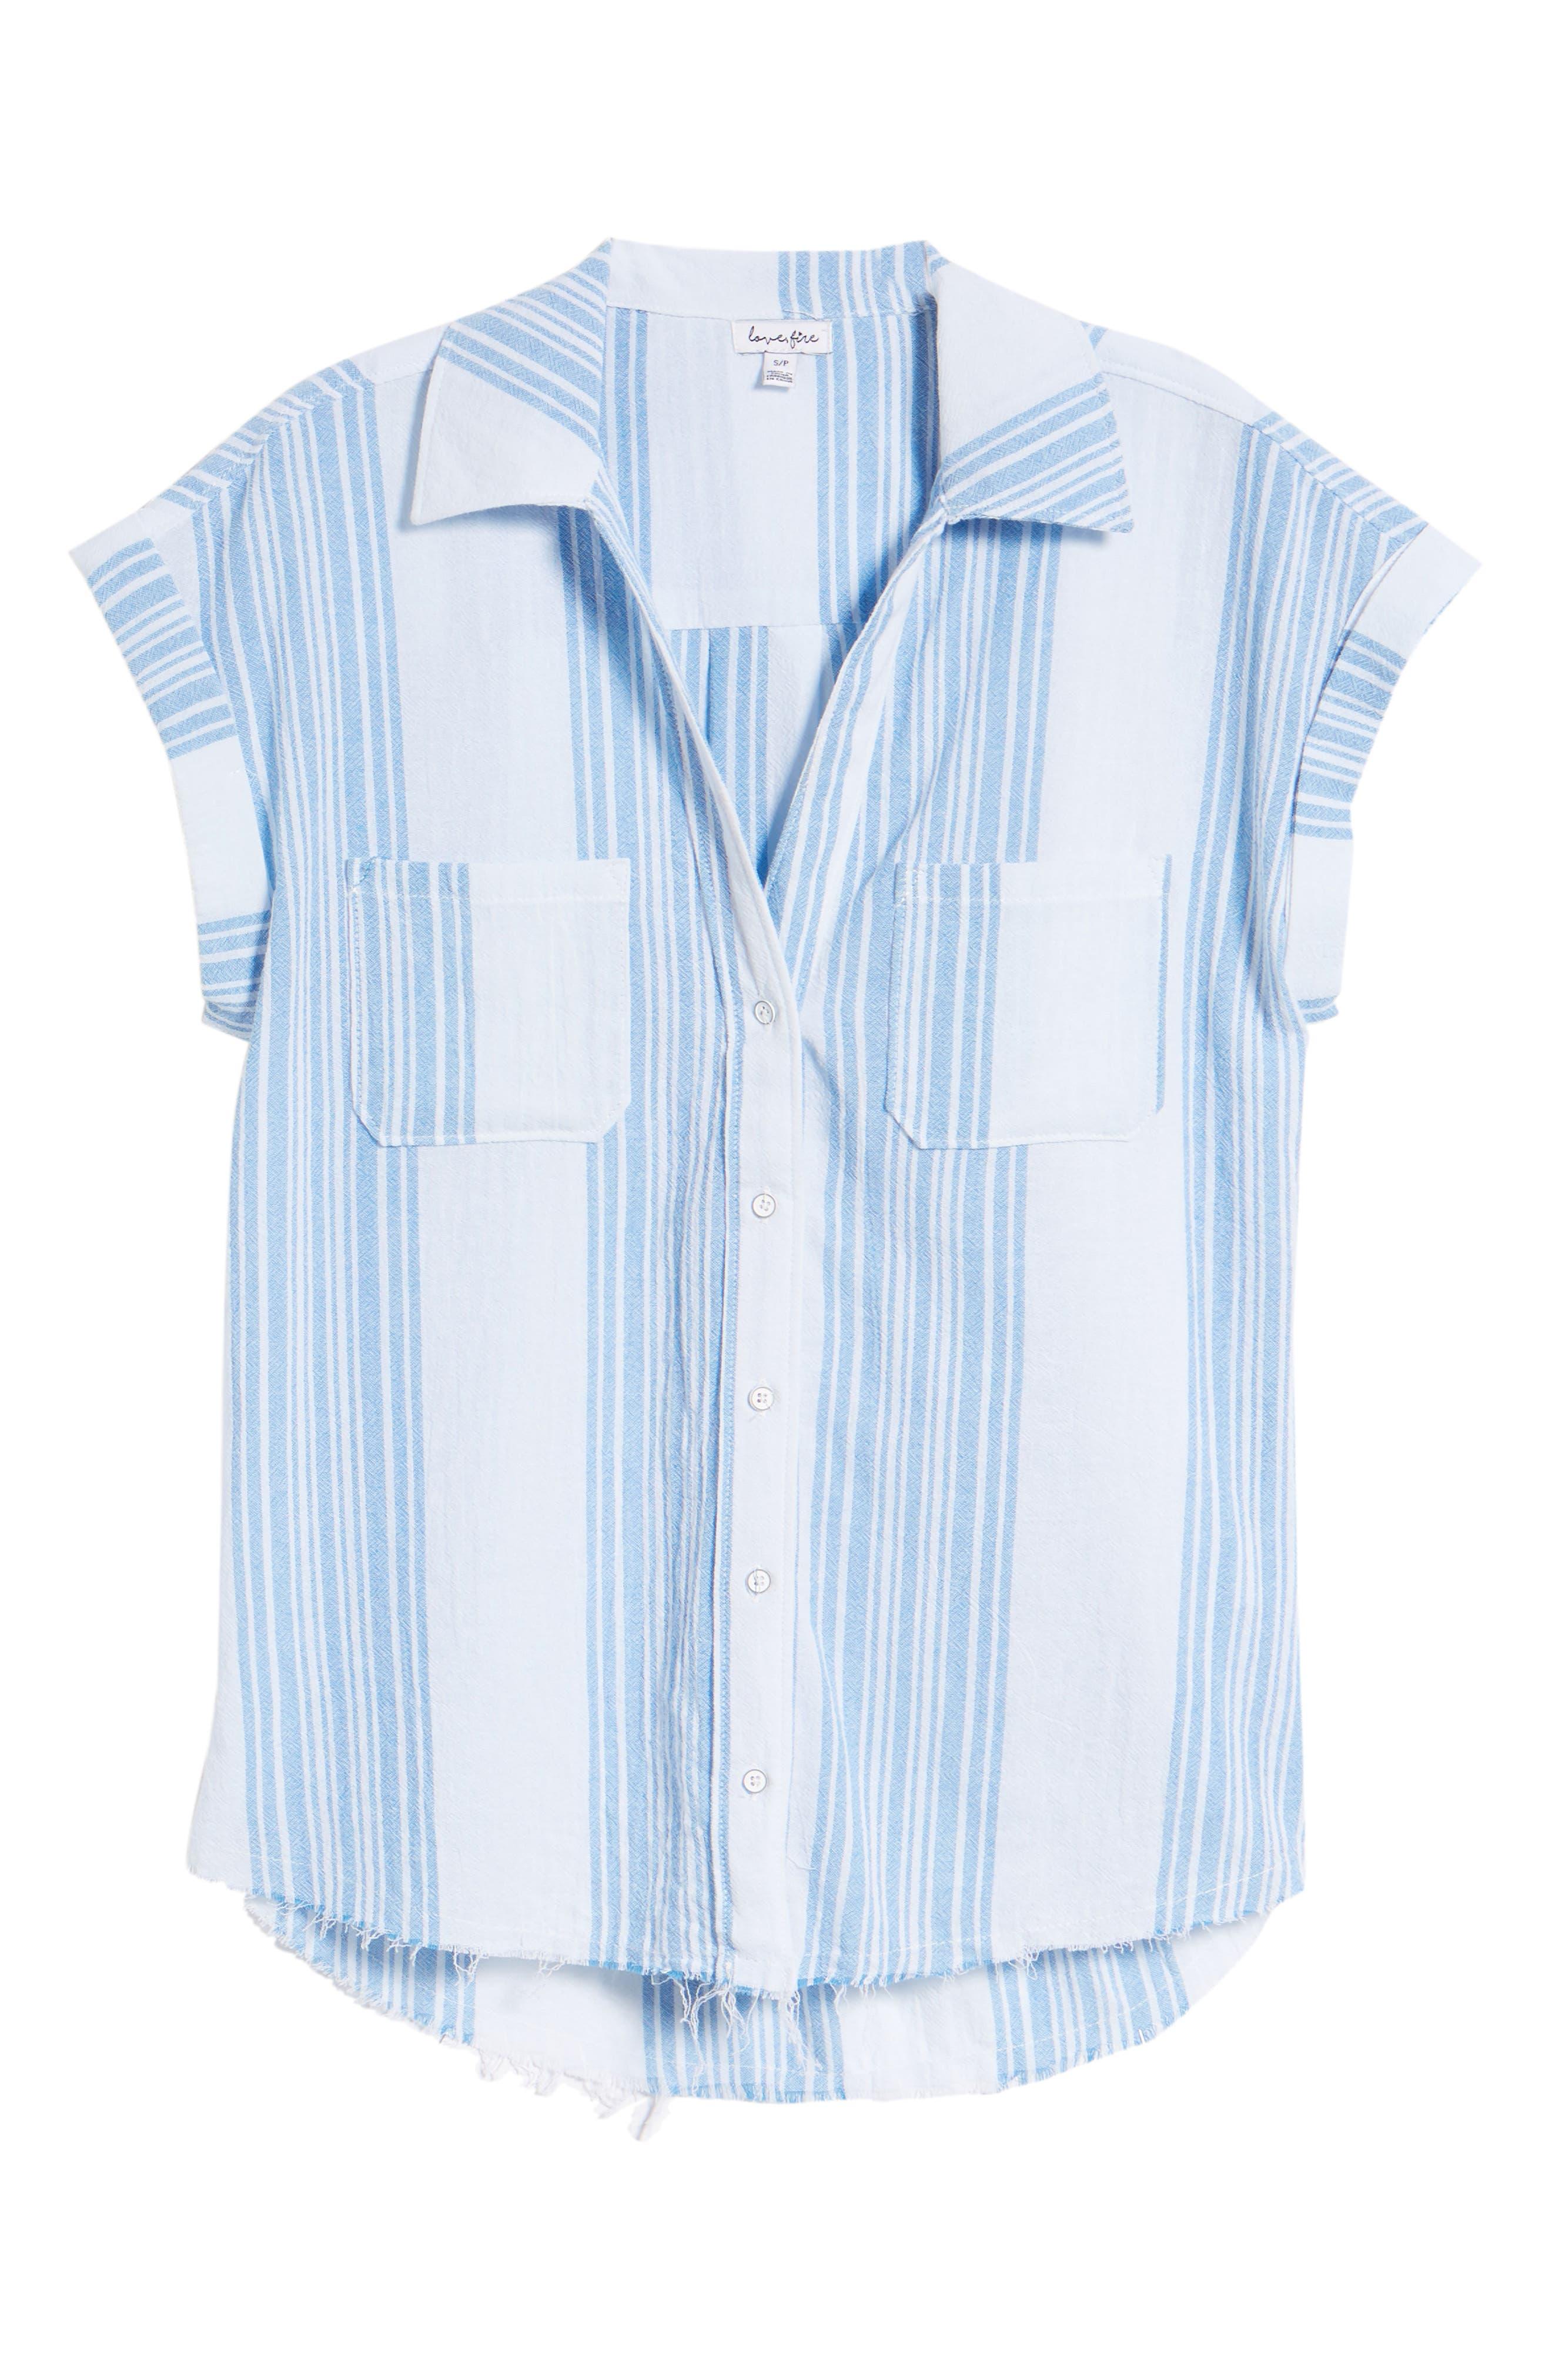 Stripe Camp Shirt,                             Alternate thumbnail 6, color,                             400